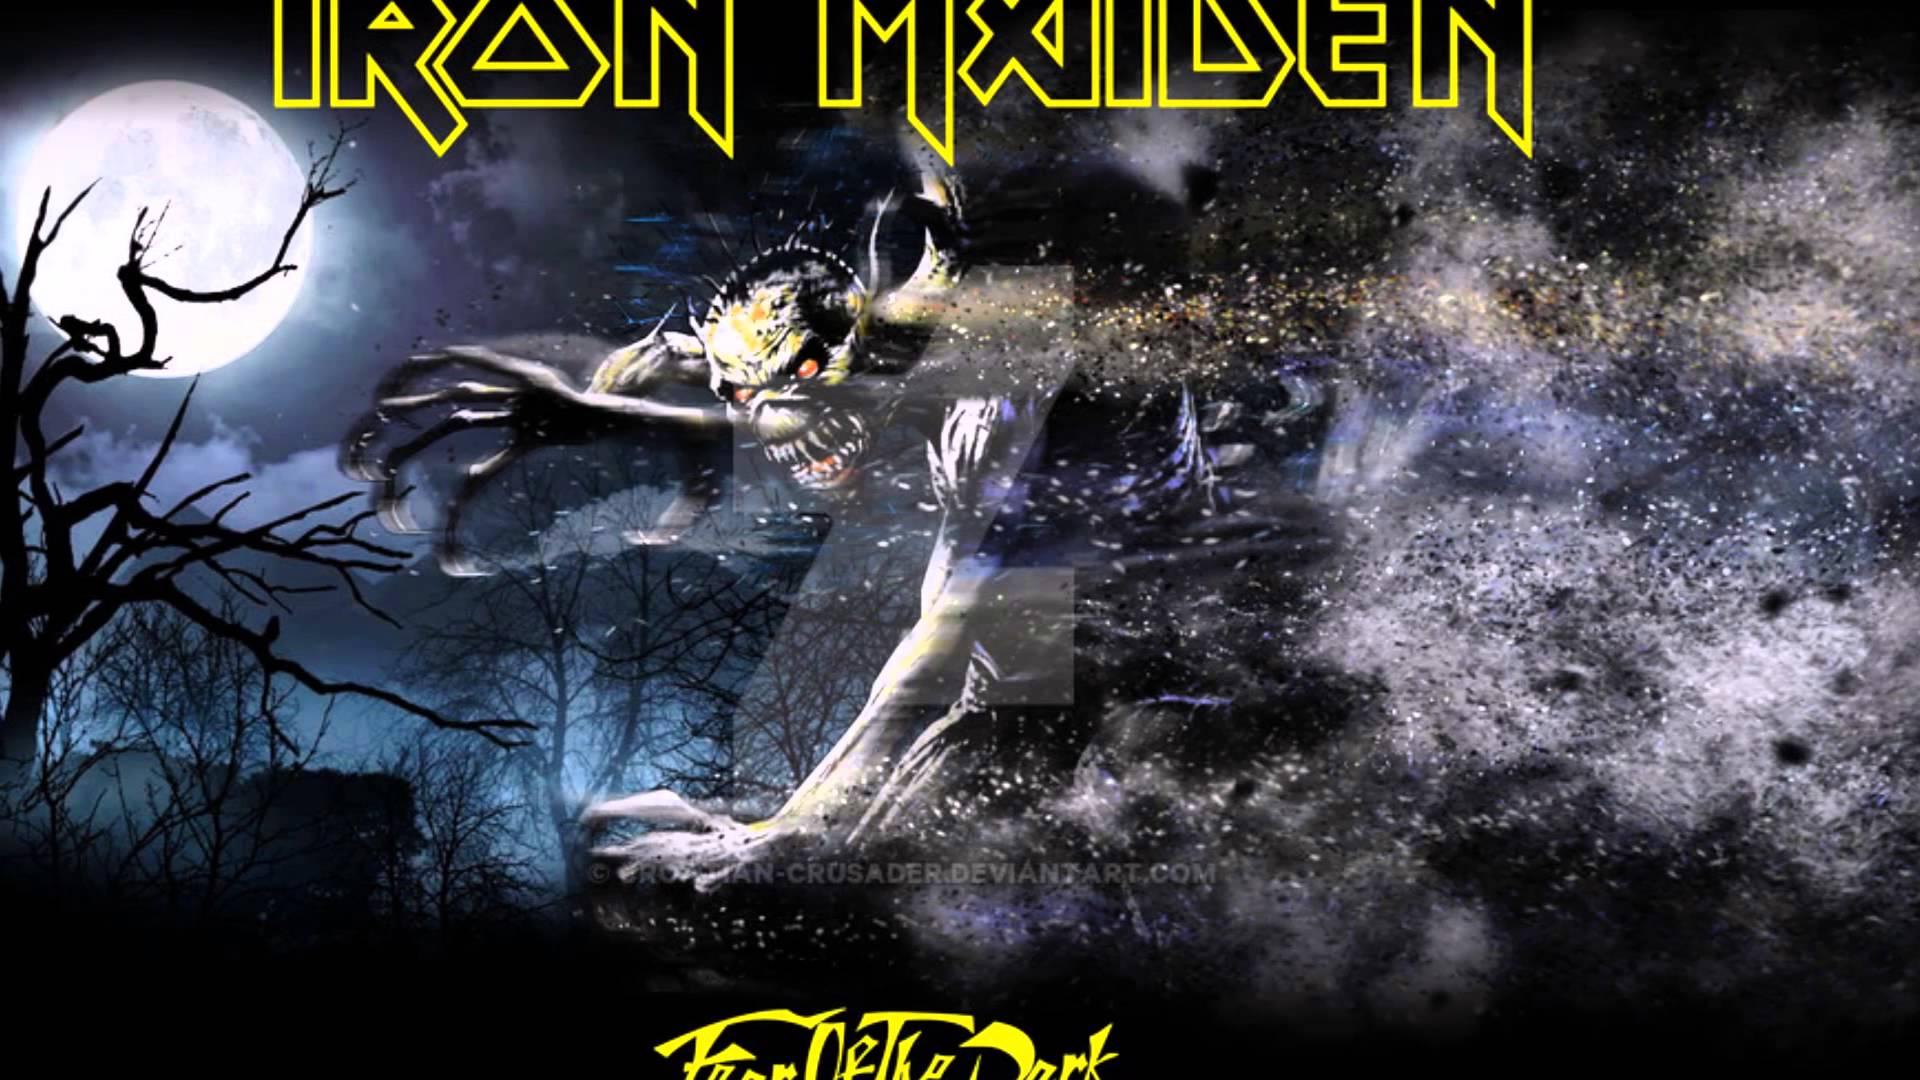 Iron Maiden Fear Of The Dark Wallpapers Photo On Wallpaper Iron